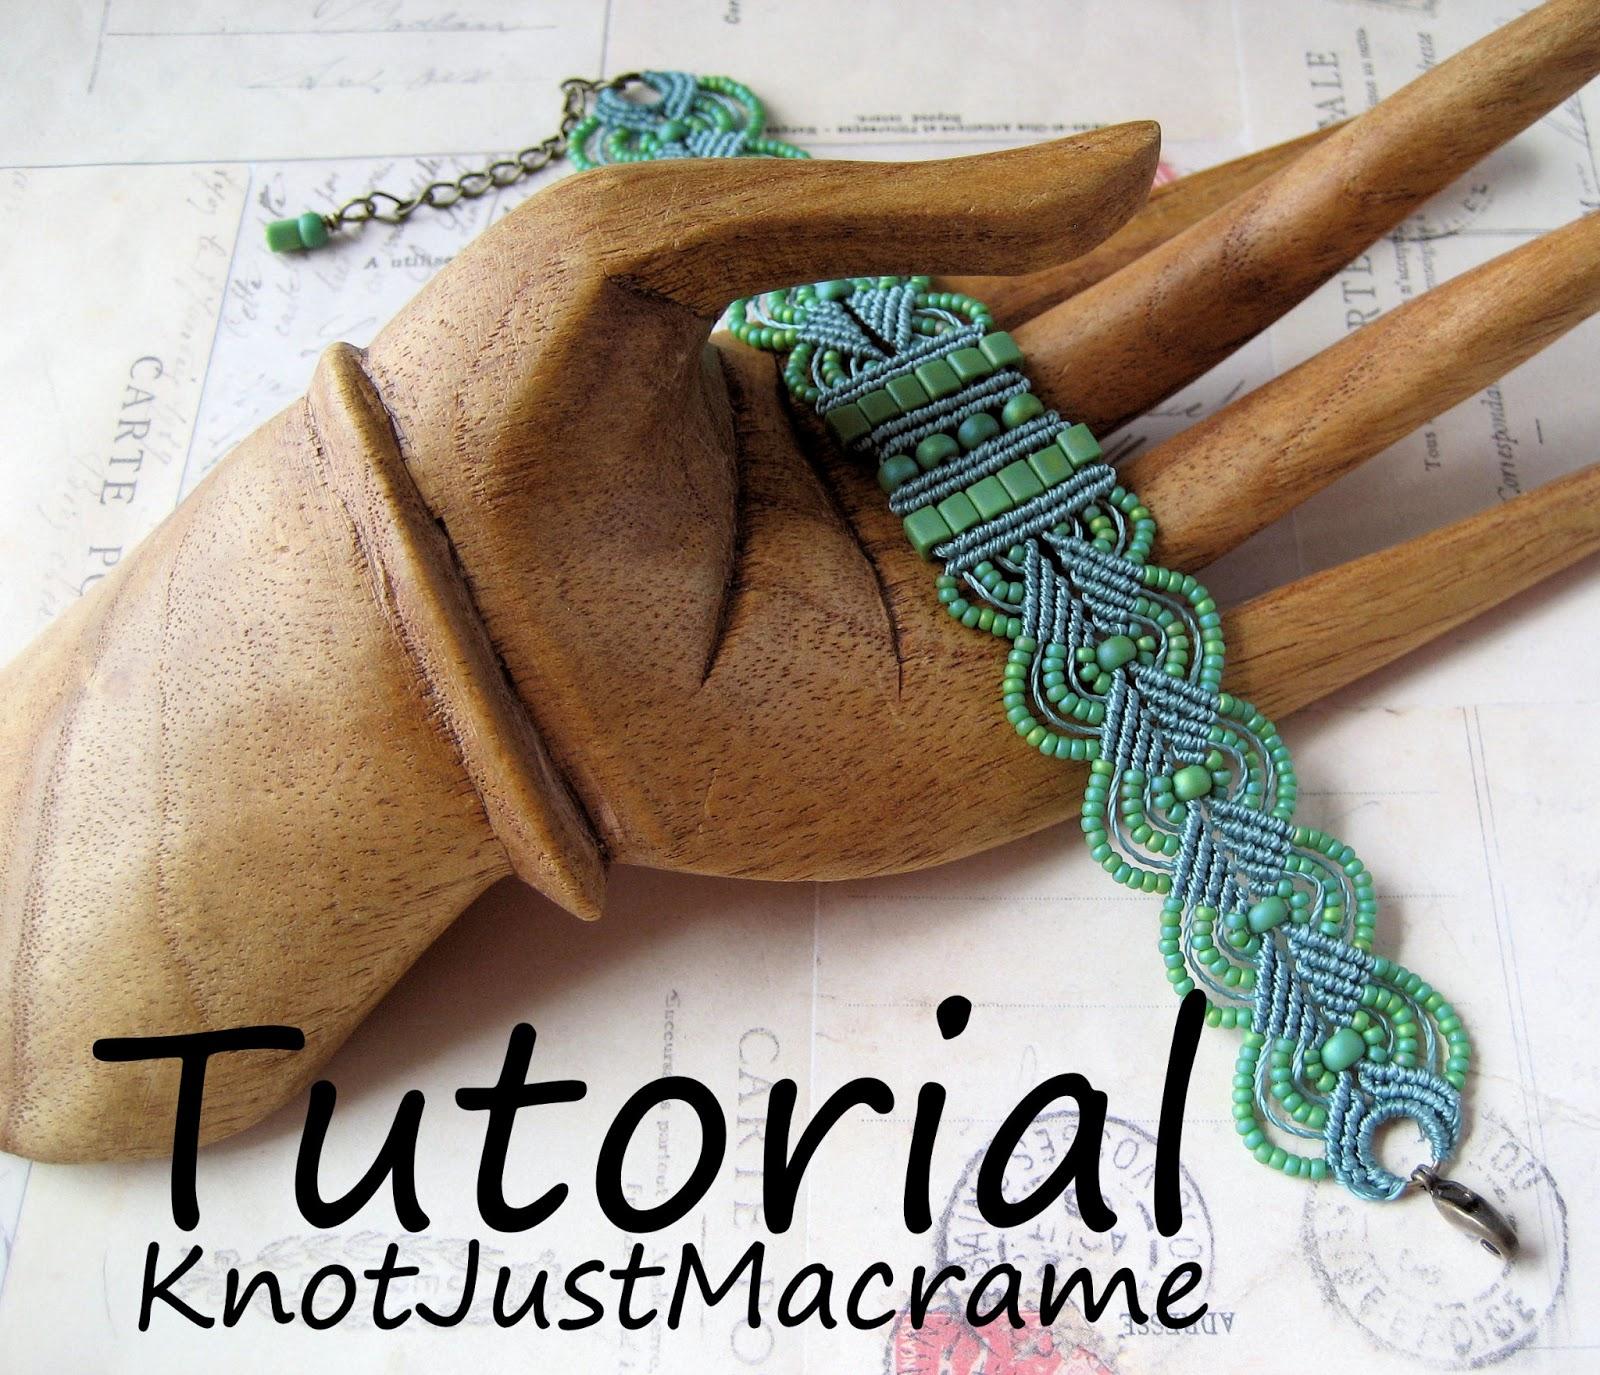 Knot Just Macrame by Sherri Stokey: Micro Macrame Bracelet Tutorials